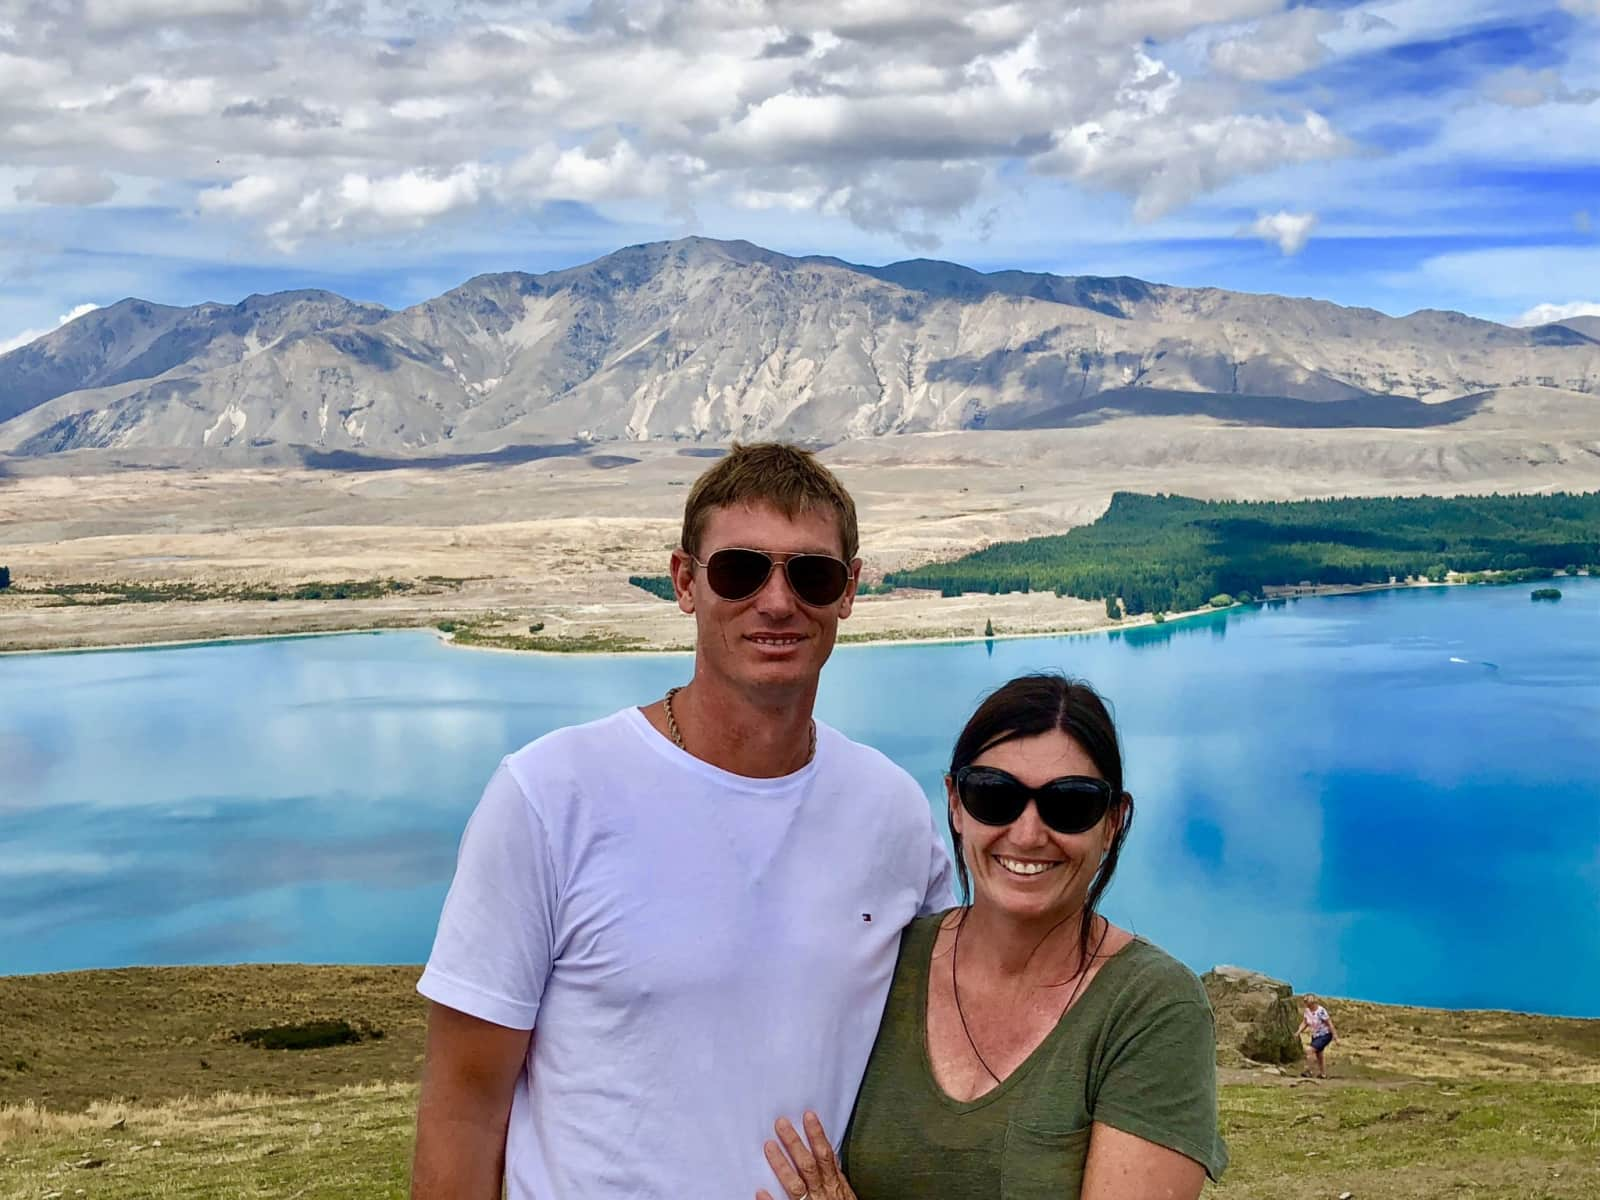 Kristin & Todd from Emerald, Queensland, Australia